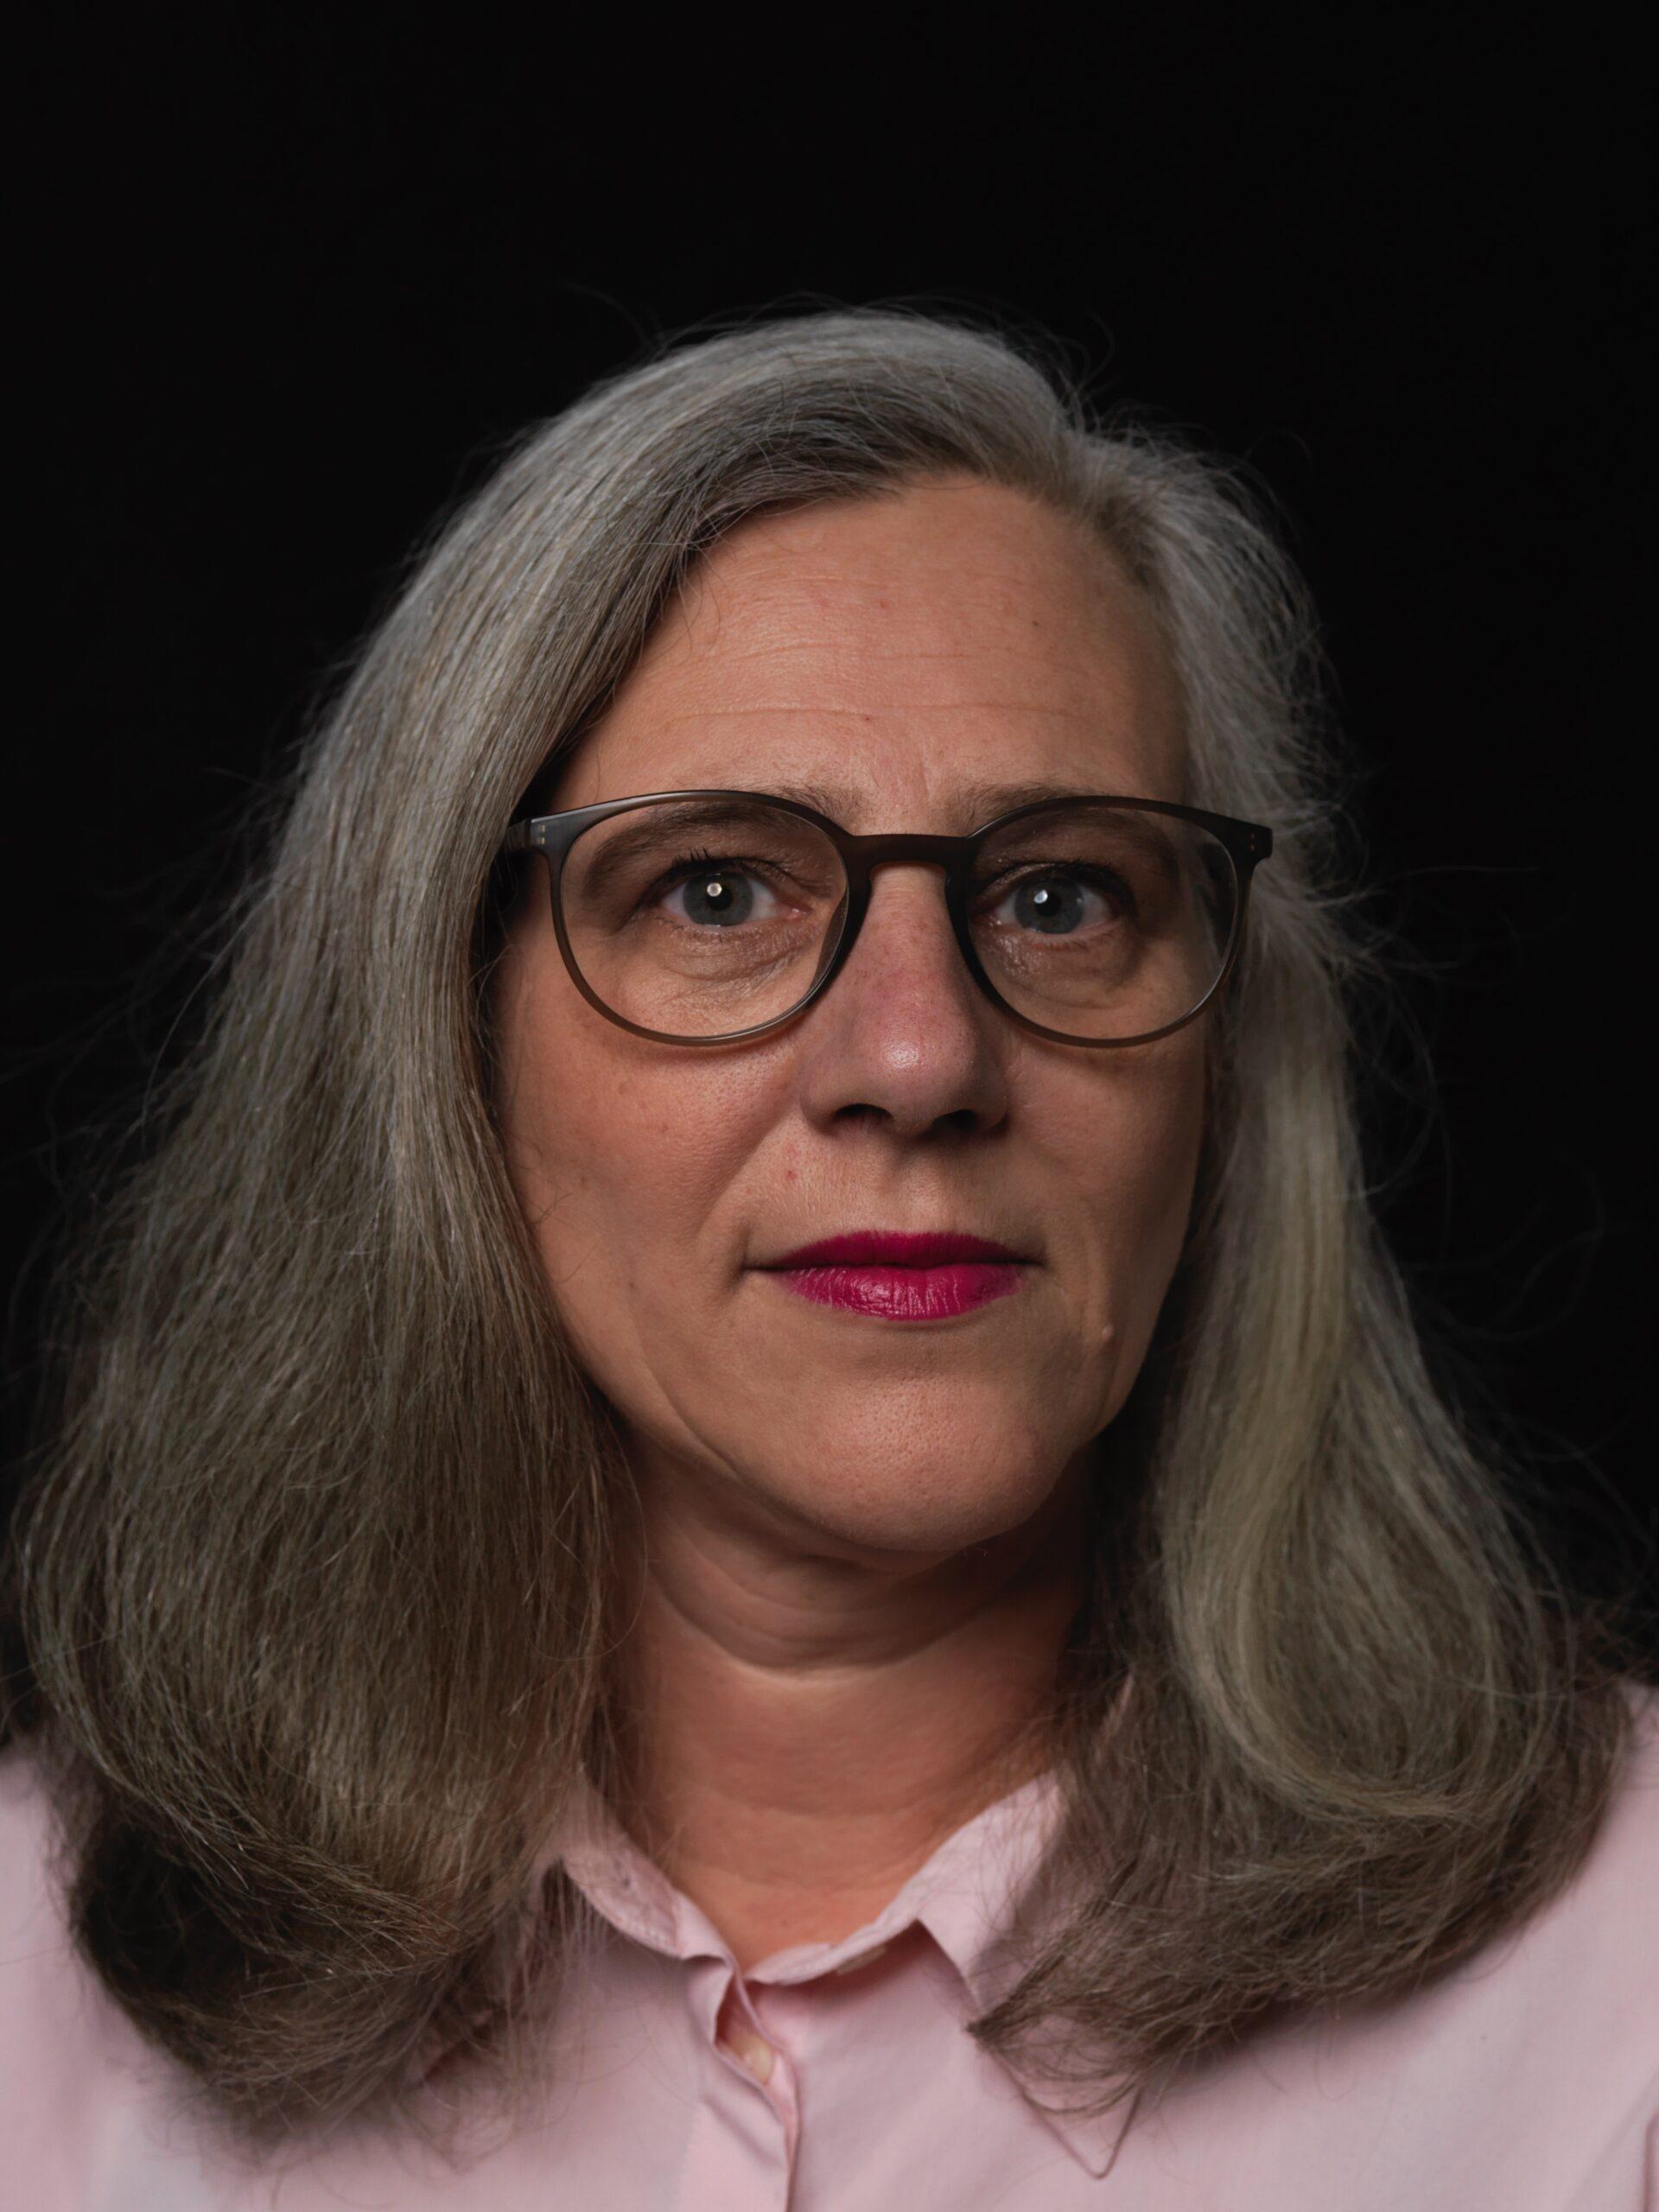 Katrin Hülsmann